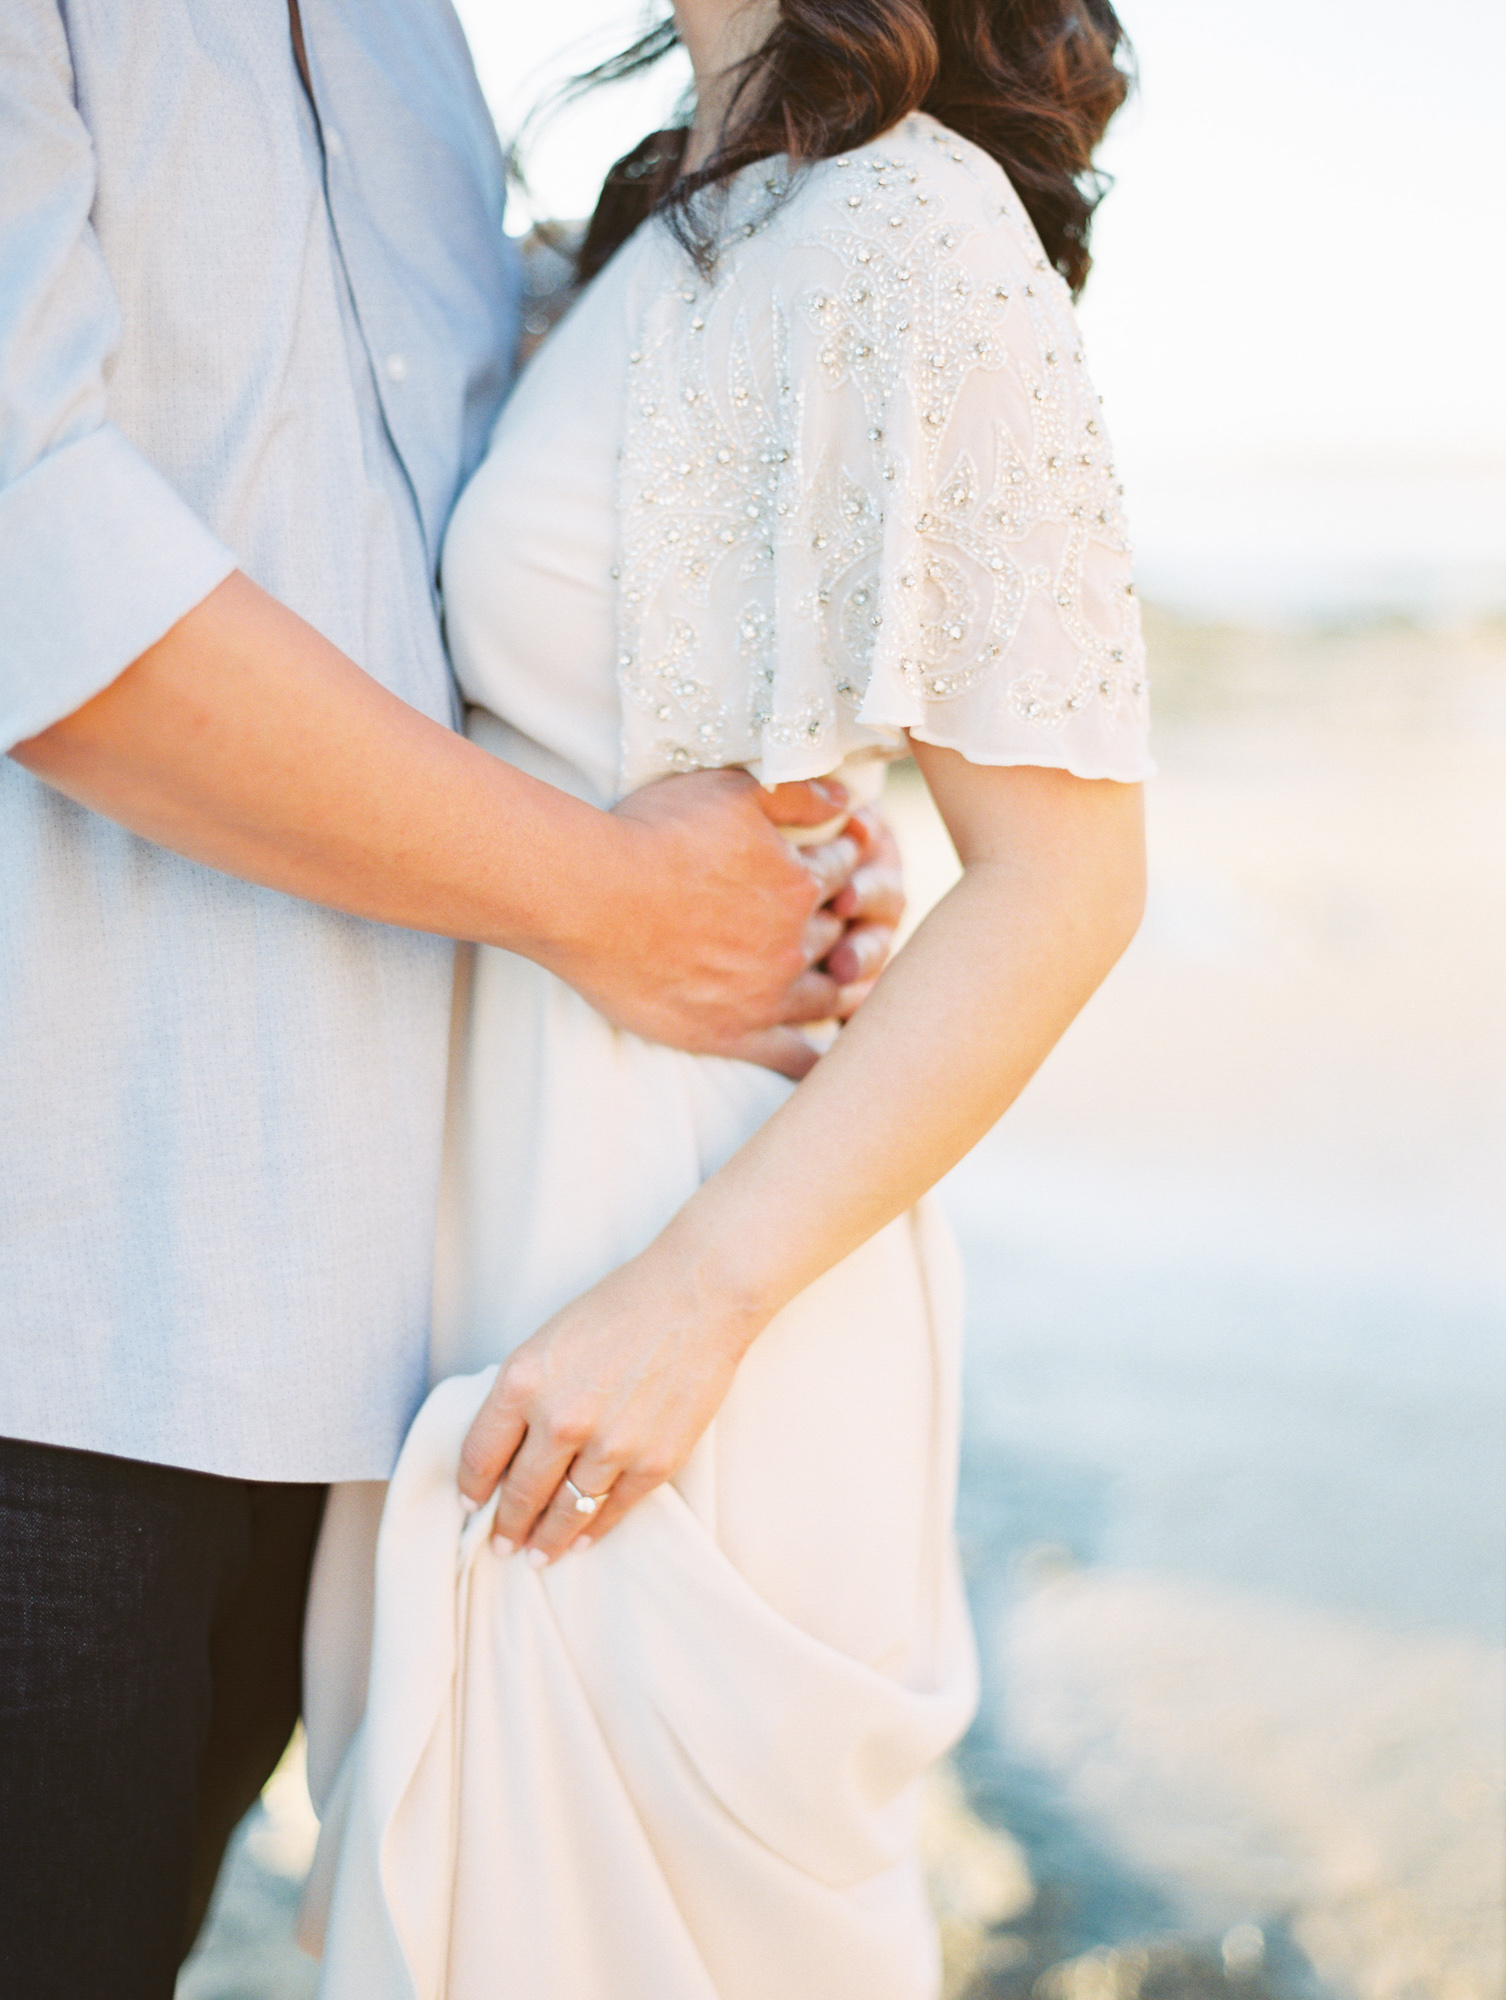 Crystal-Cove-Engagement-Kristina-Adams-18.jpg